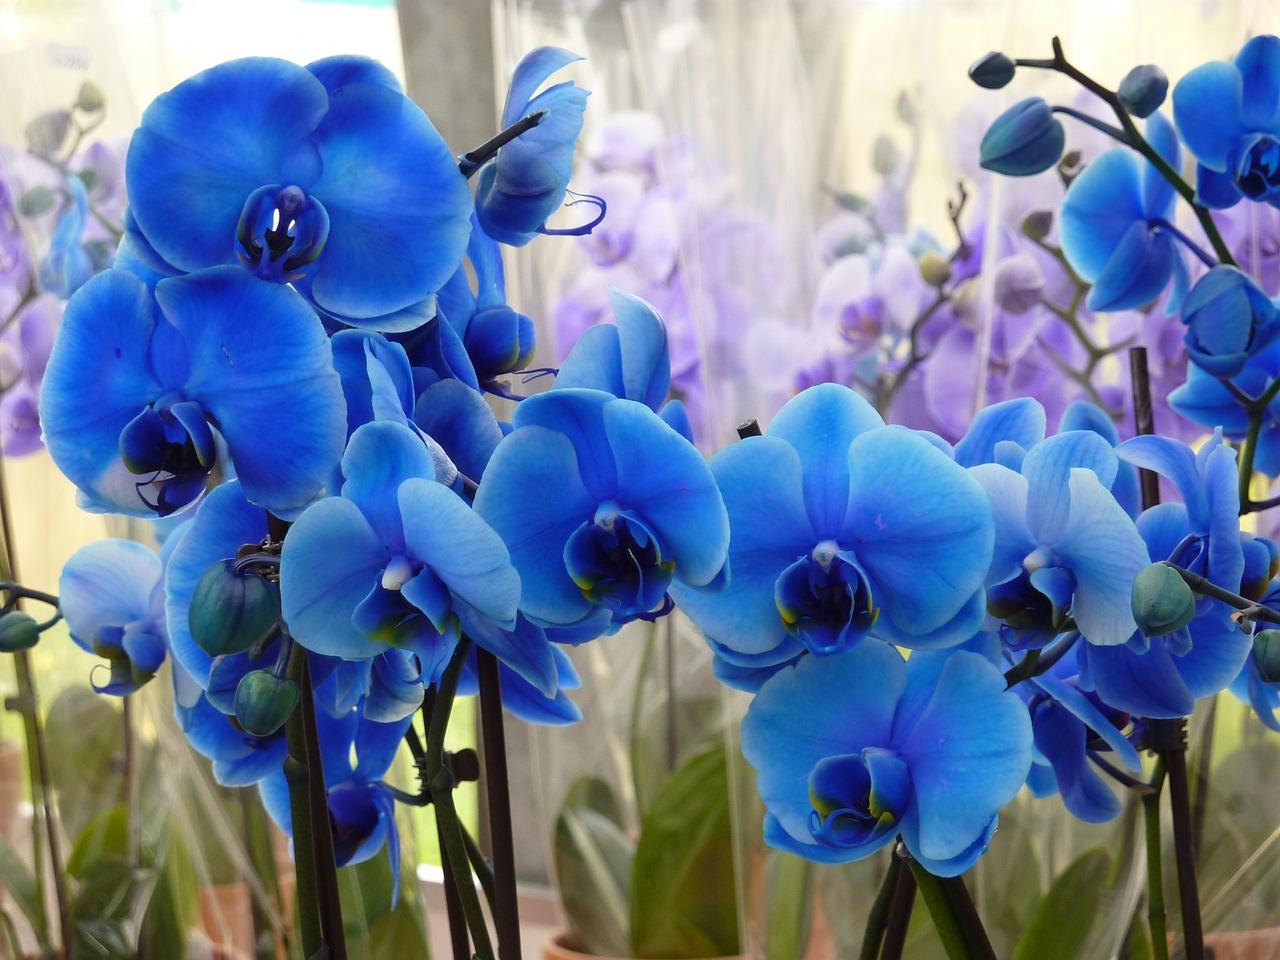 фото орхидеи фаленопсис голубая особенностей викки